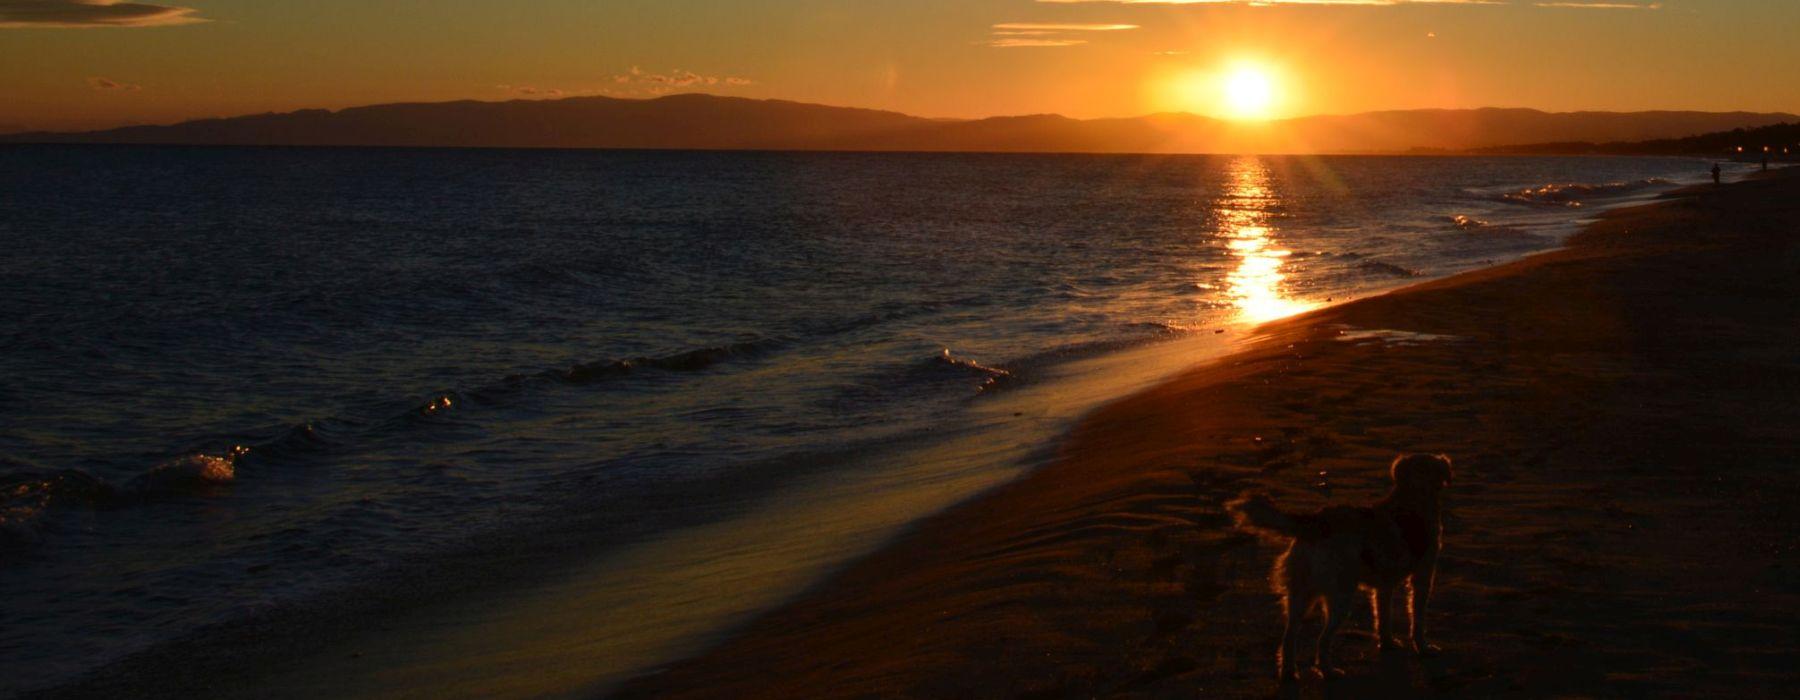 sunset beach spiaggia tramonto calabria